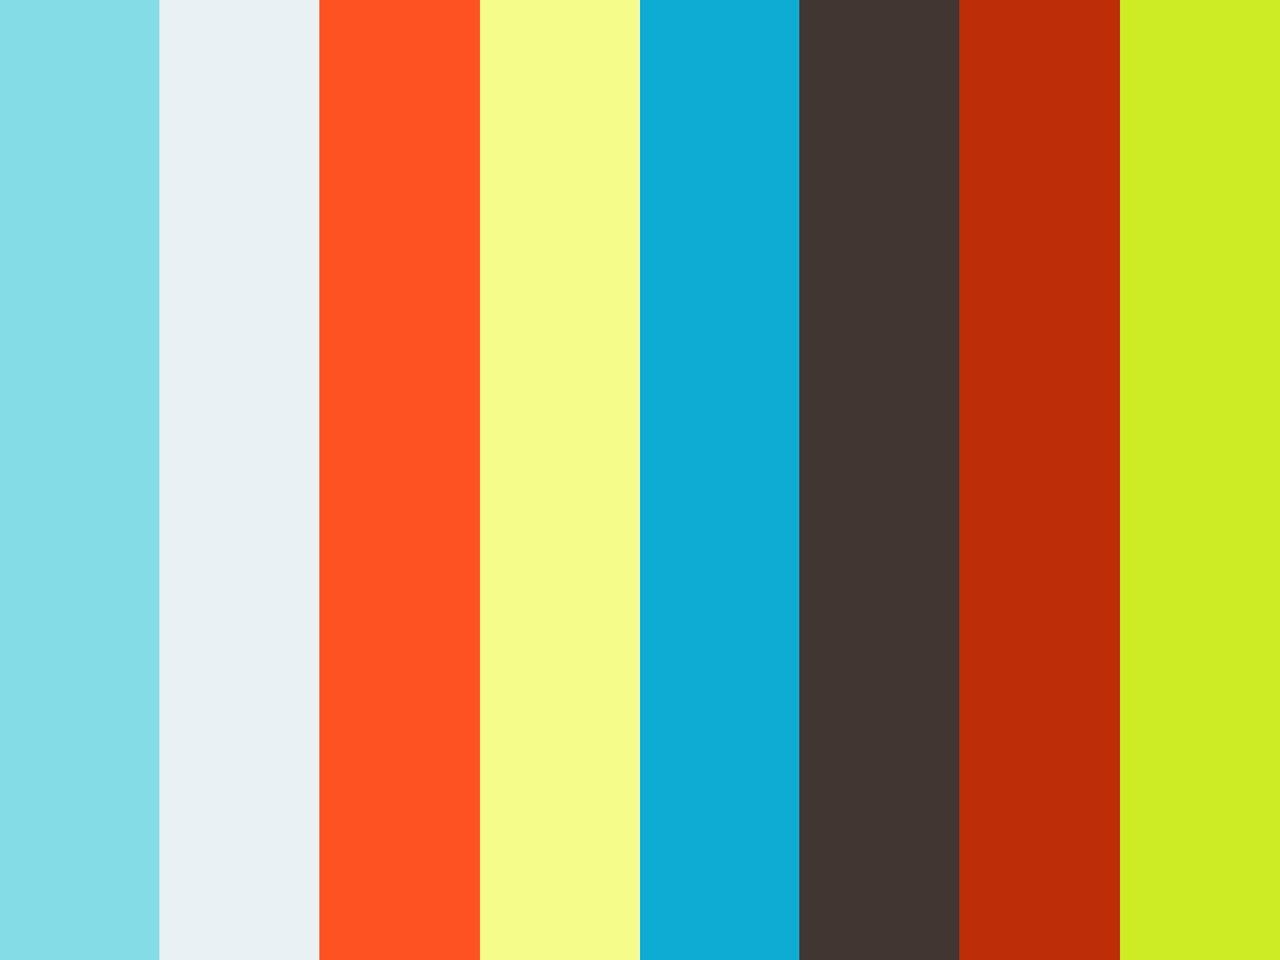 Log profile and custom color grade